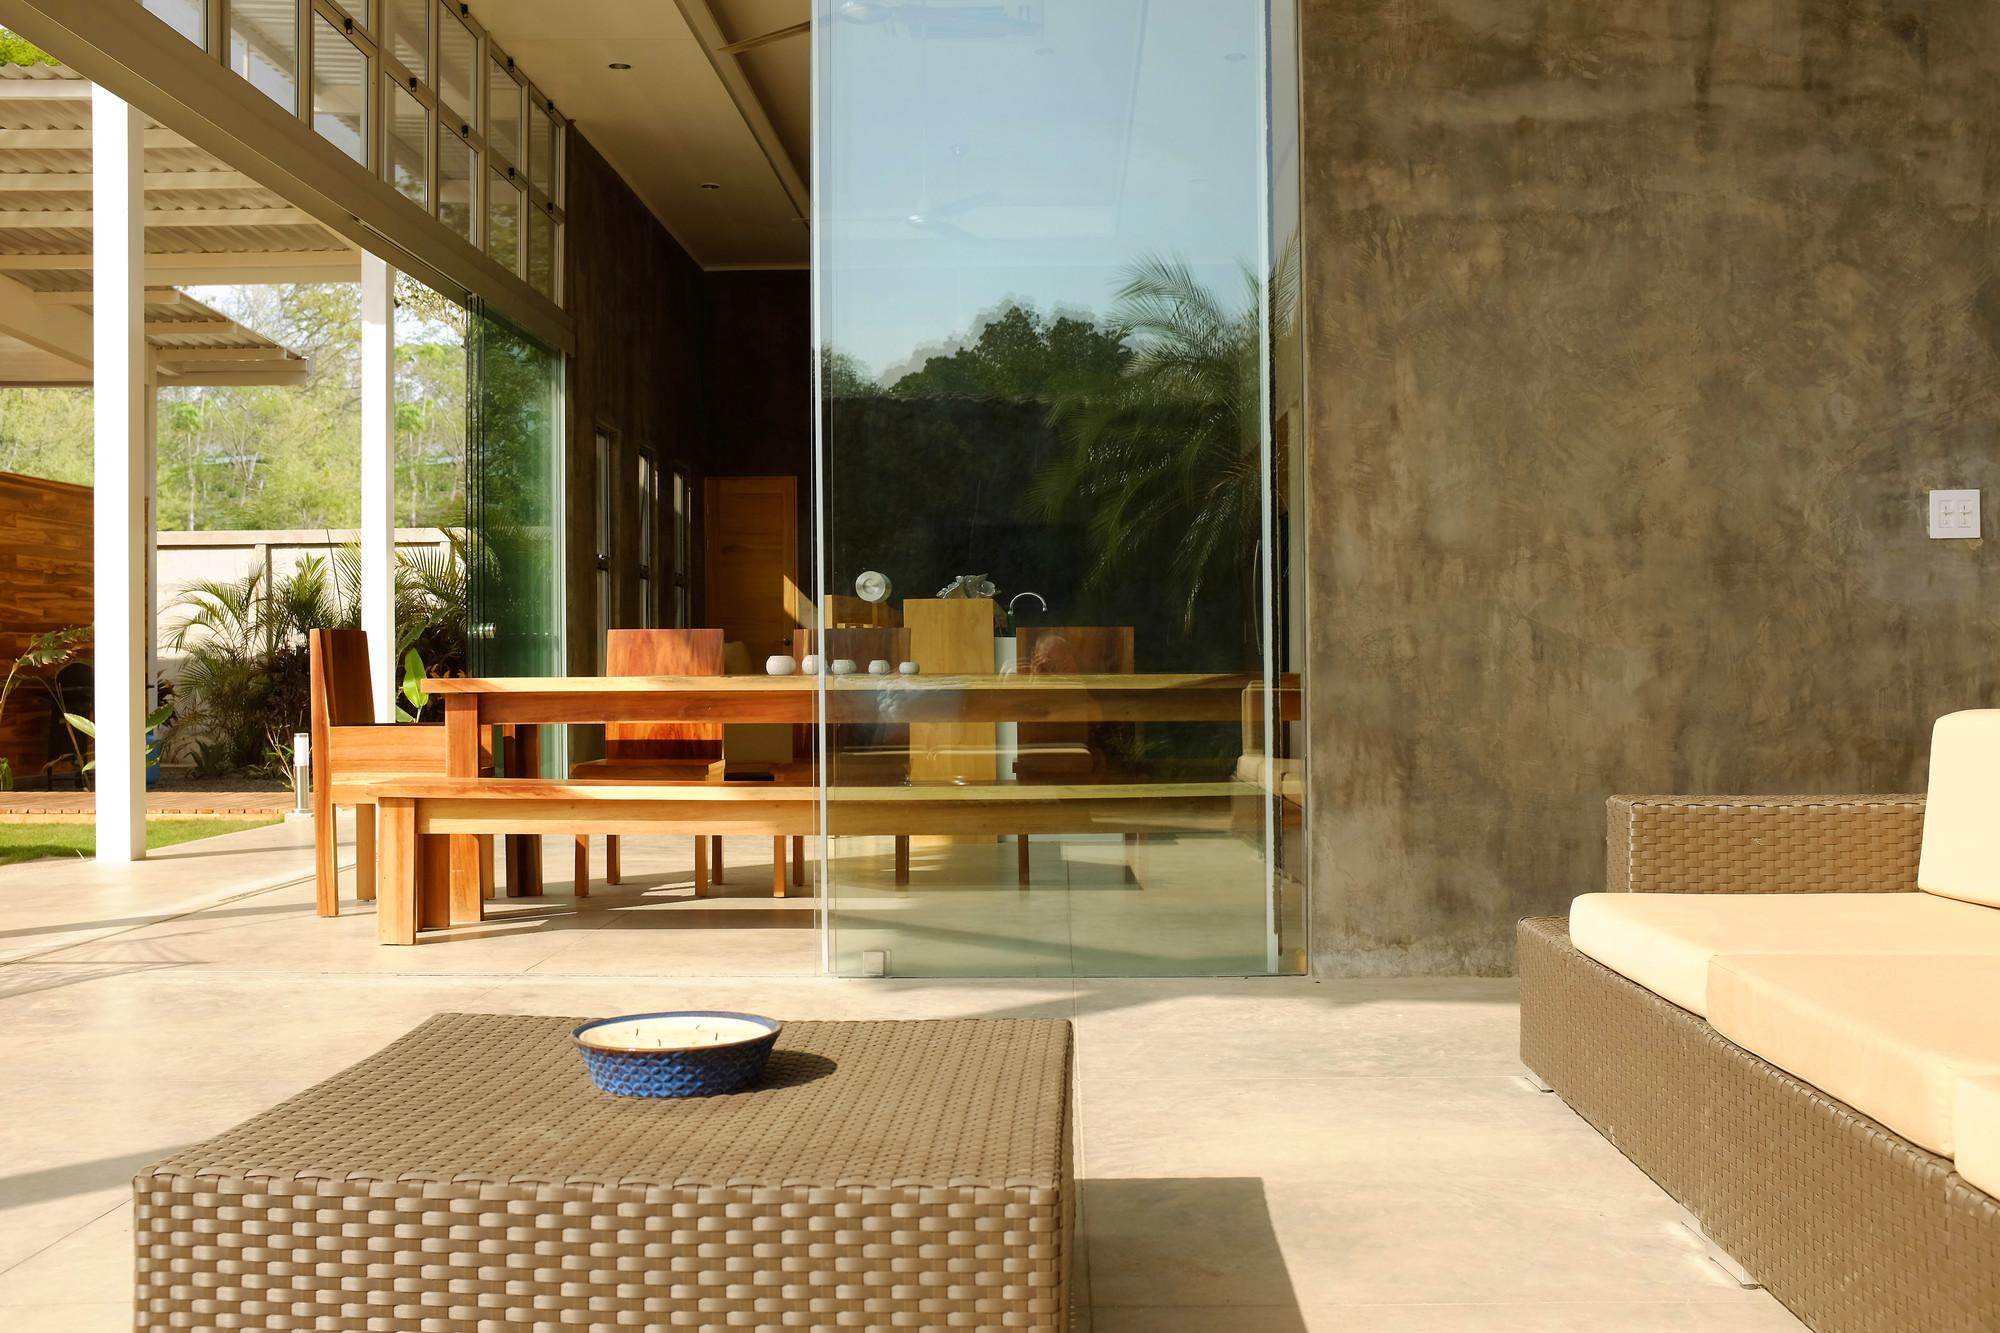 Galer a de casa jard n del mar salagnac arquitectos 9 for Casas jardin del mar